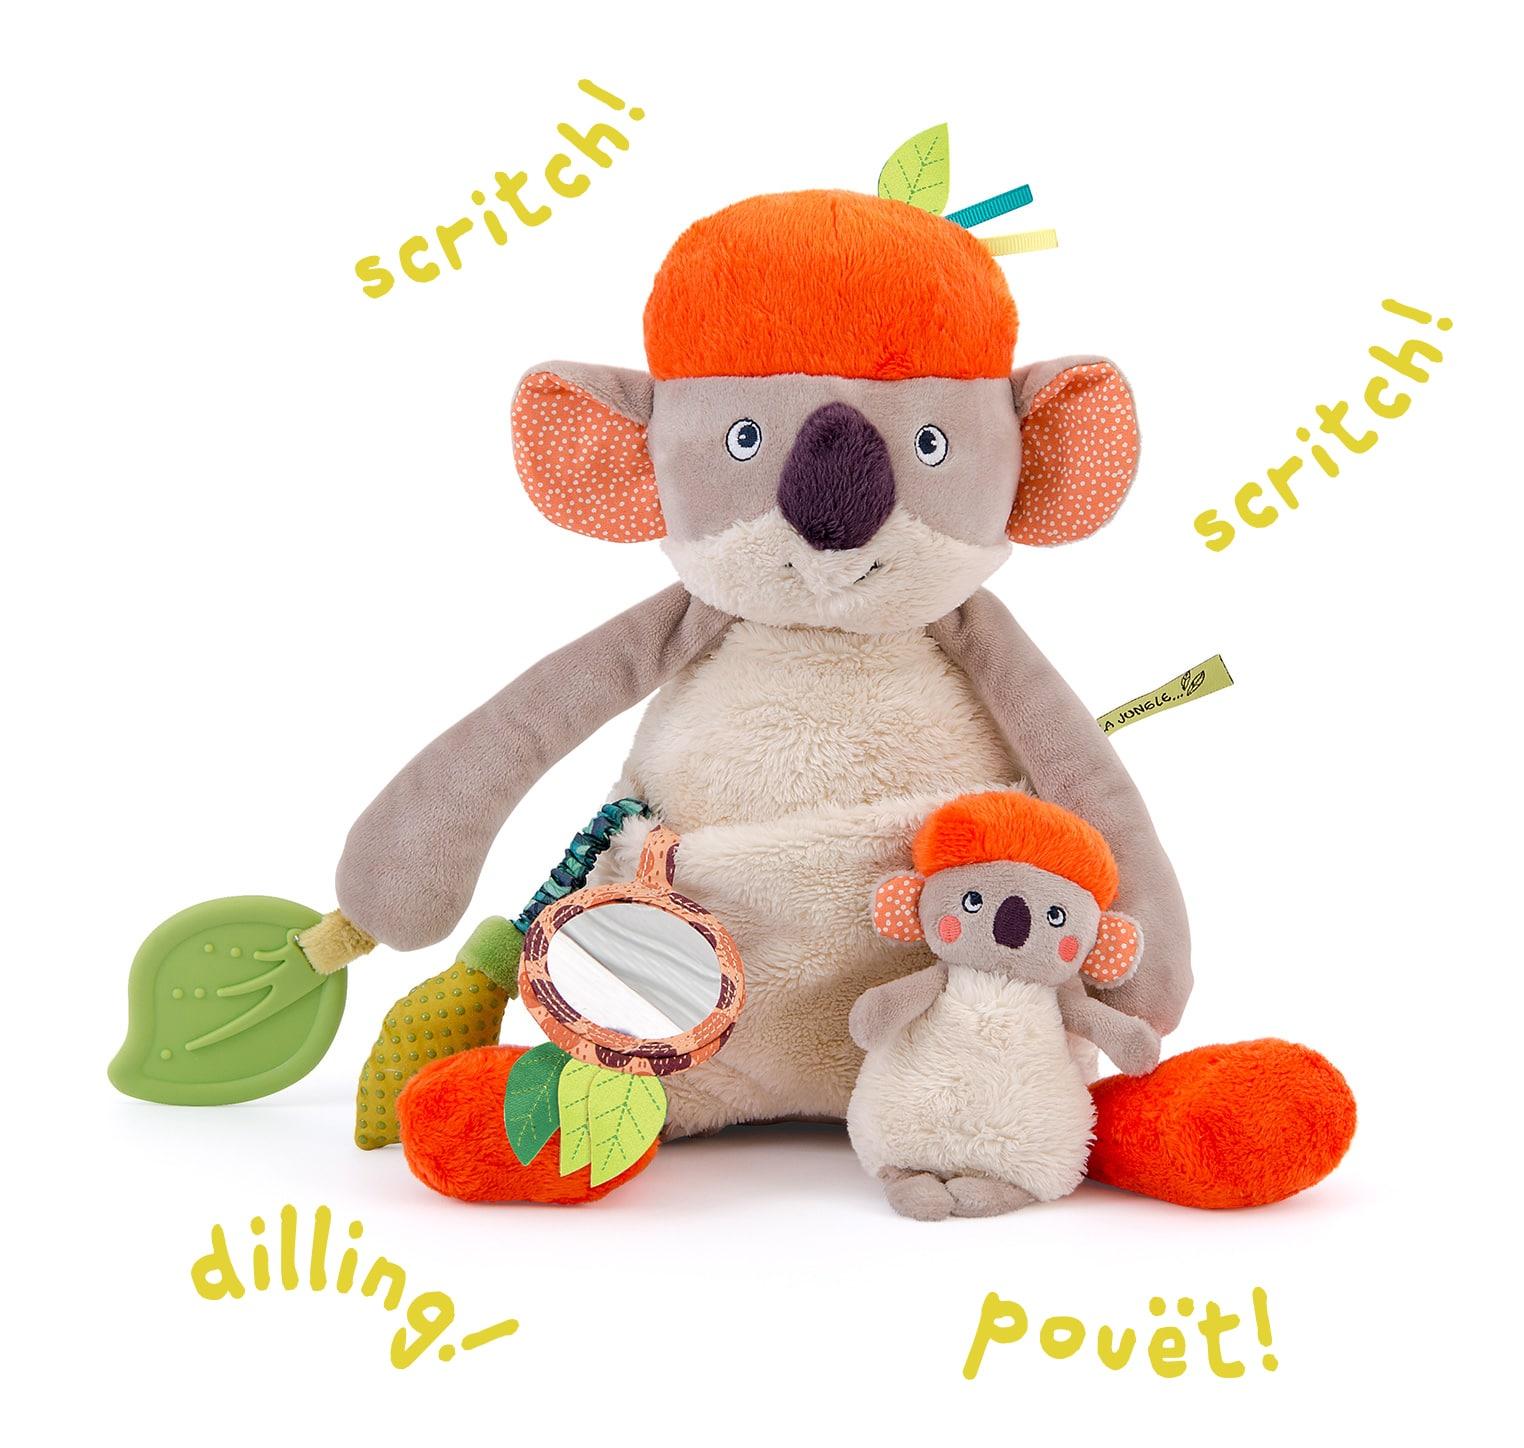 koala activity toy - wholesale